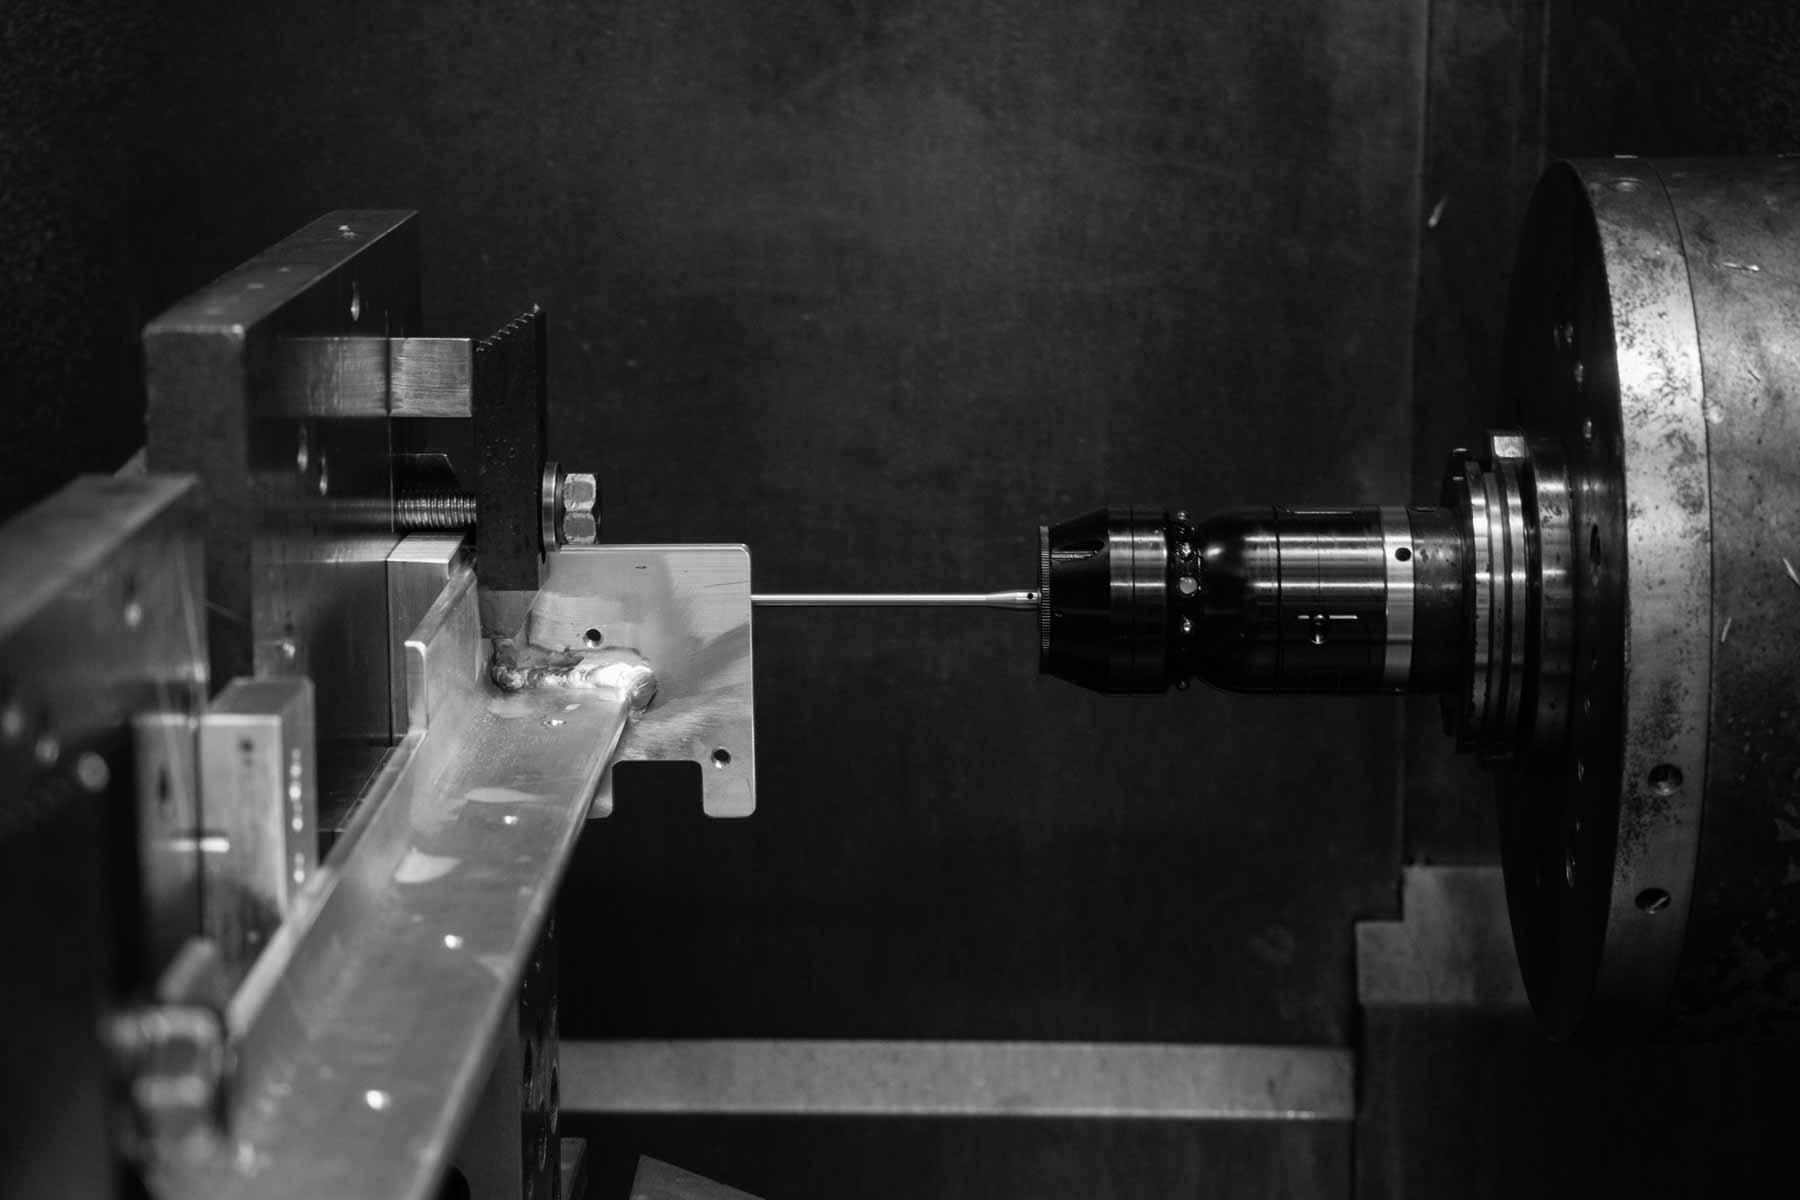 Titletown Mfg CNC horizontal milling machine